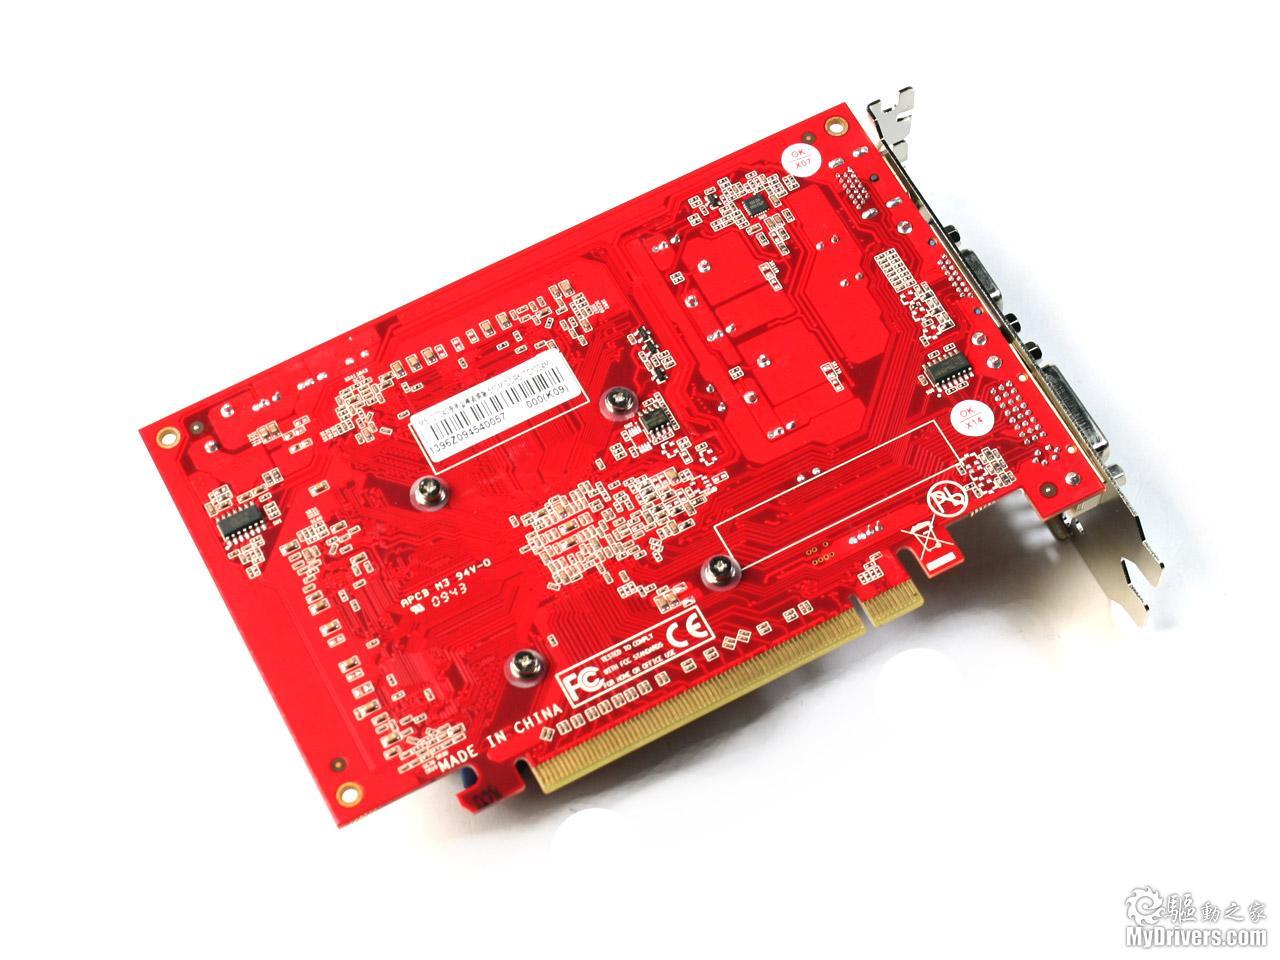 电路板 1280_960